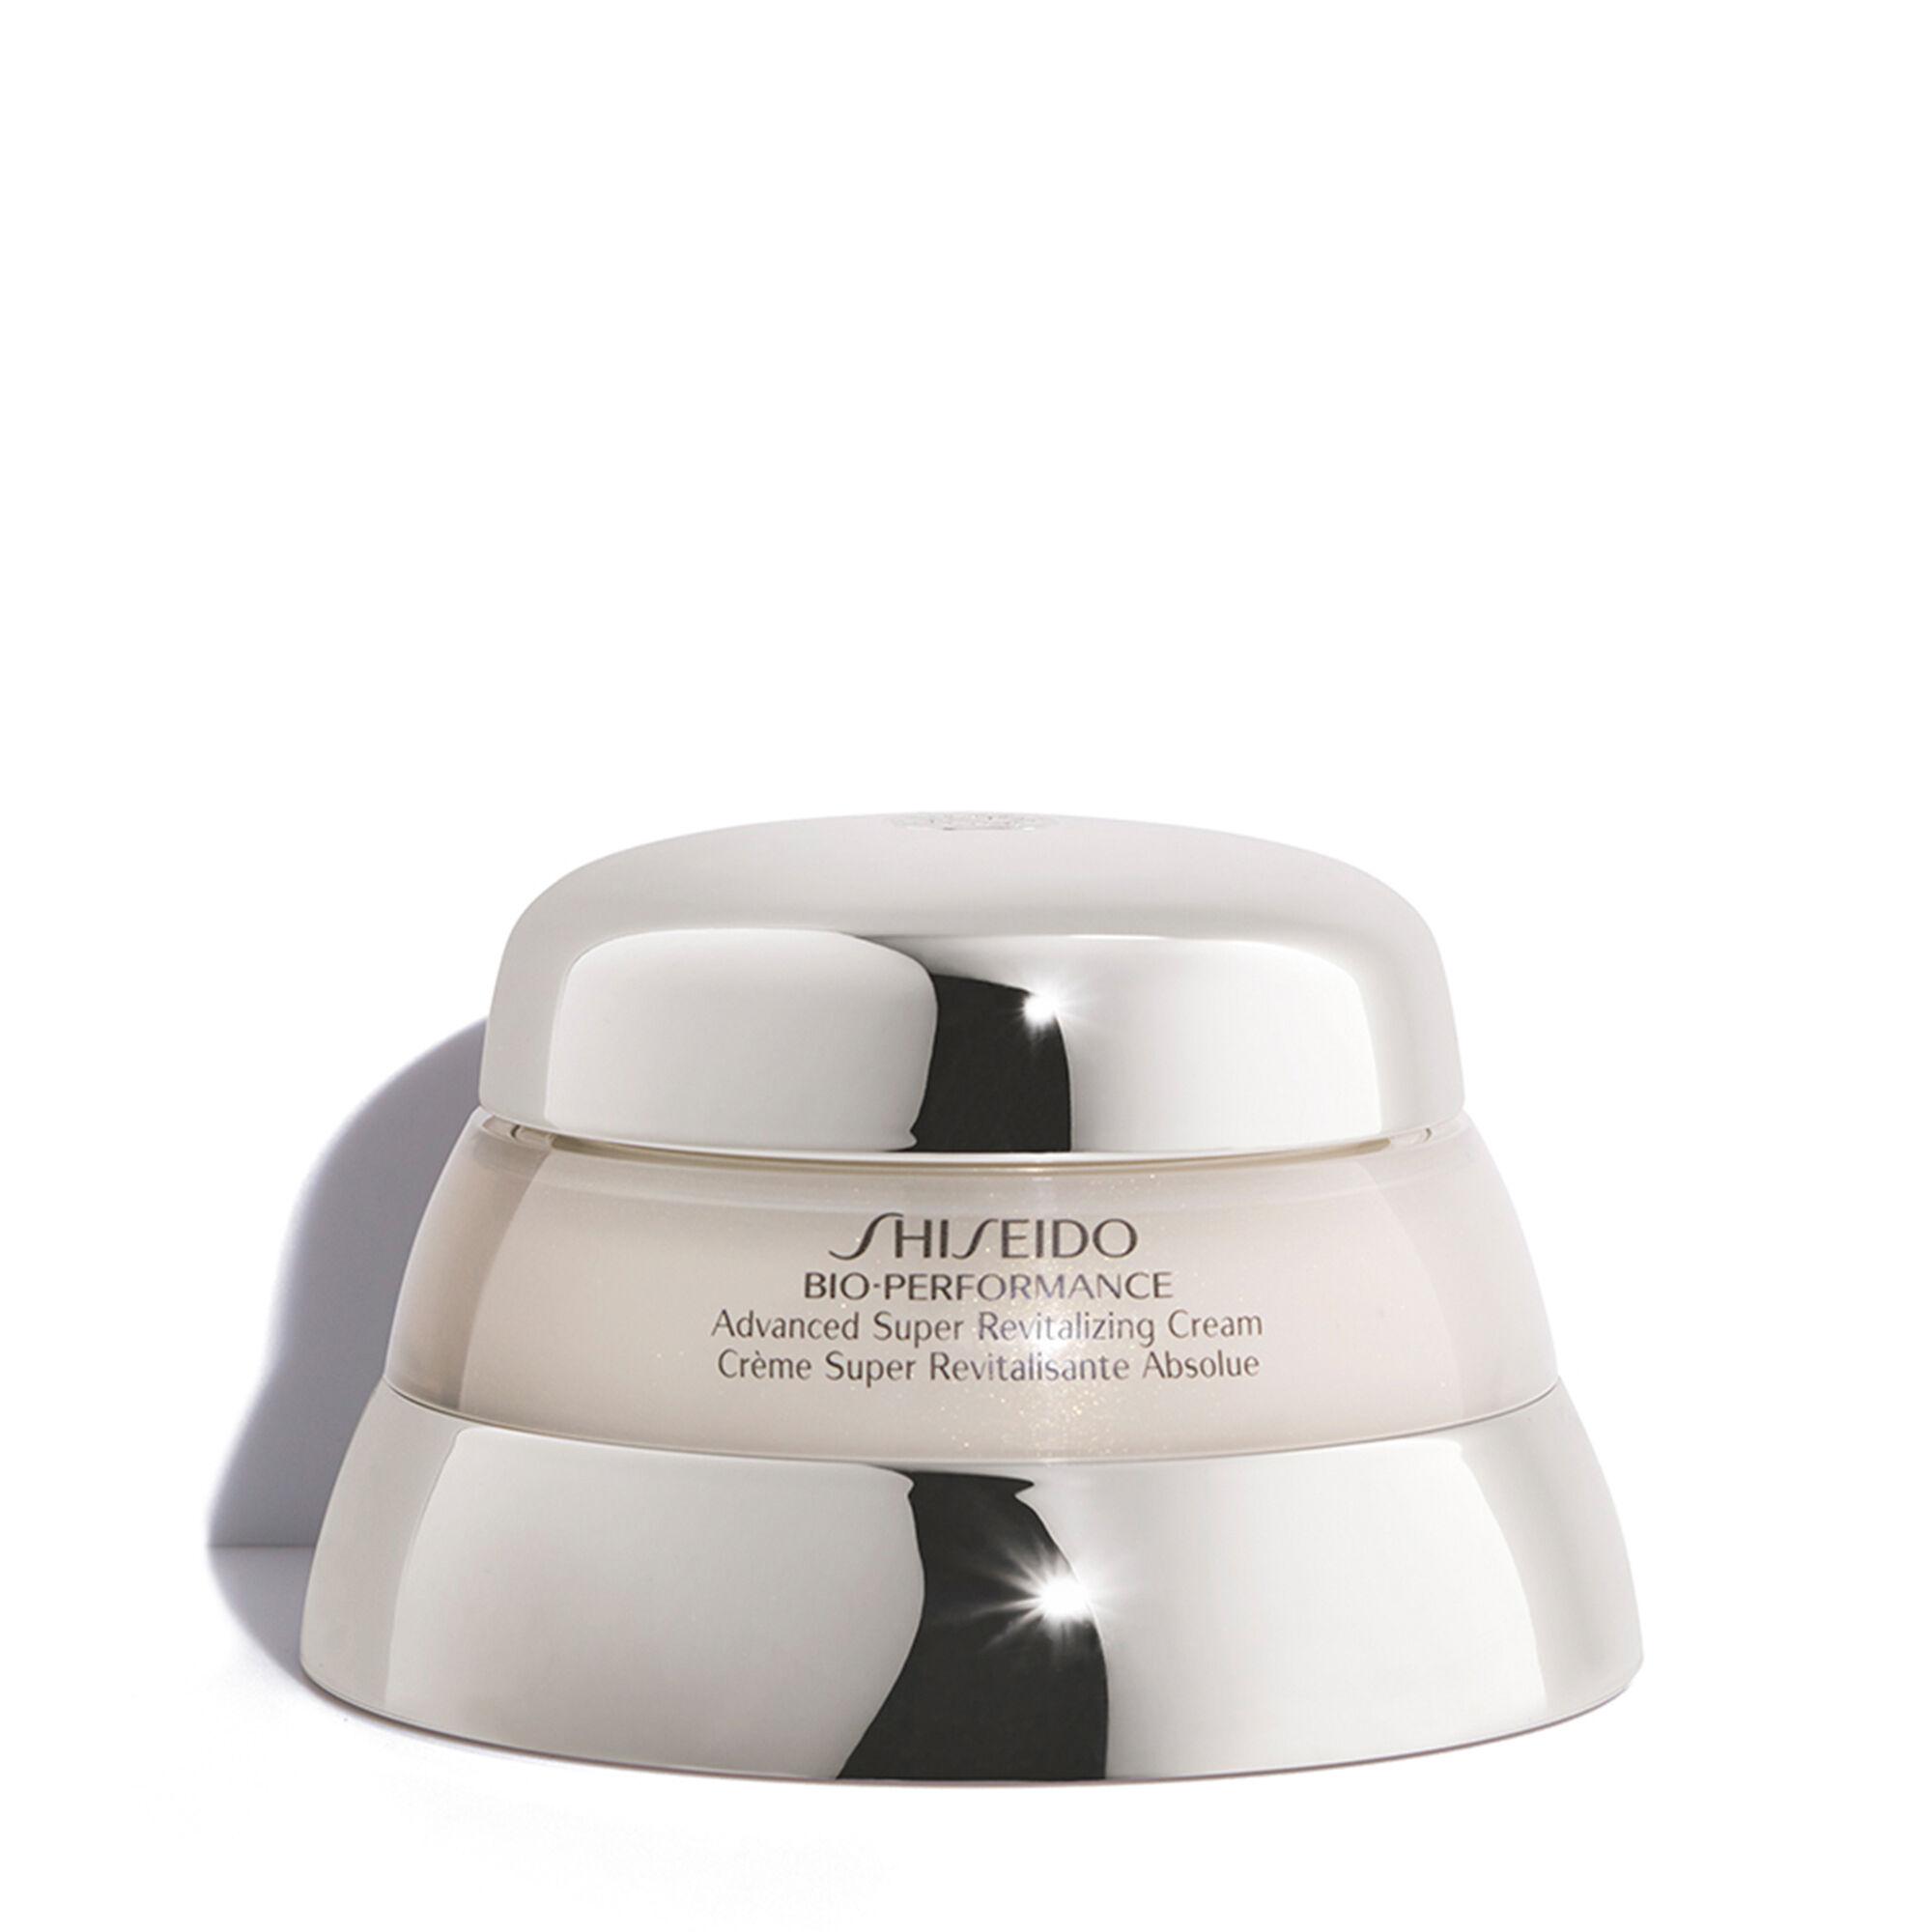 3 Pack - Shiseido Bio-Performance Advanced Super Revitalizing Cream 1.7 oz Zapzyt Pore Treatment Gel, with Salicylic Acid, for Overnight Results, 0.75 Oz (Pack of 4)